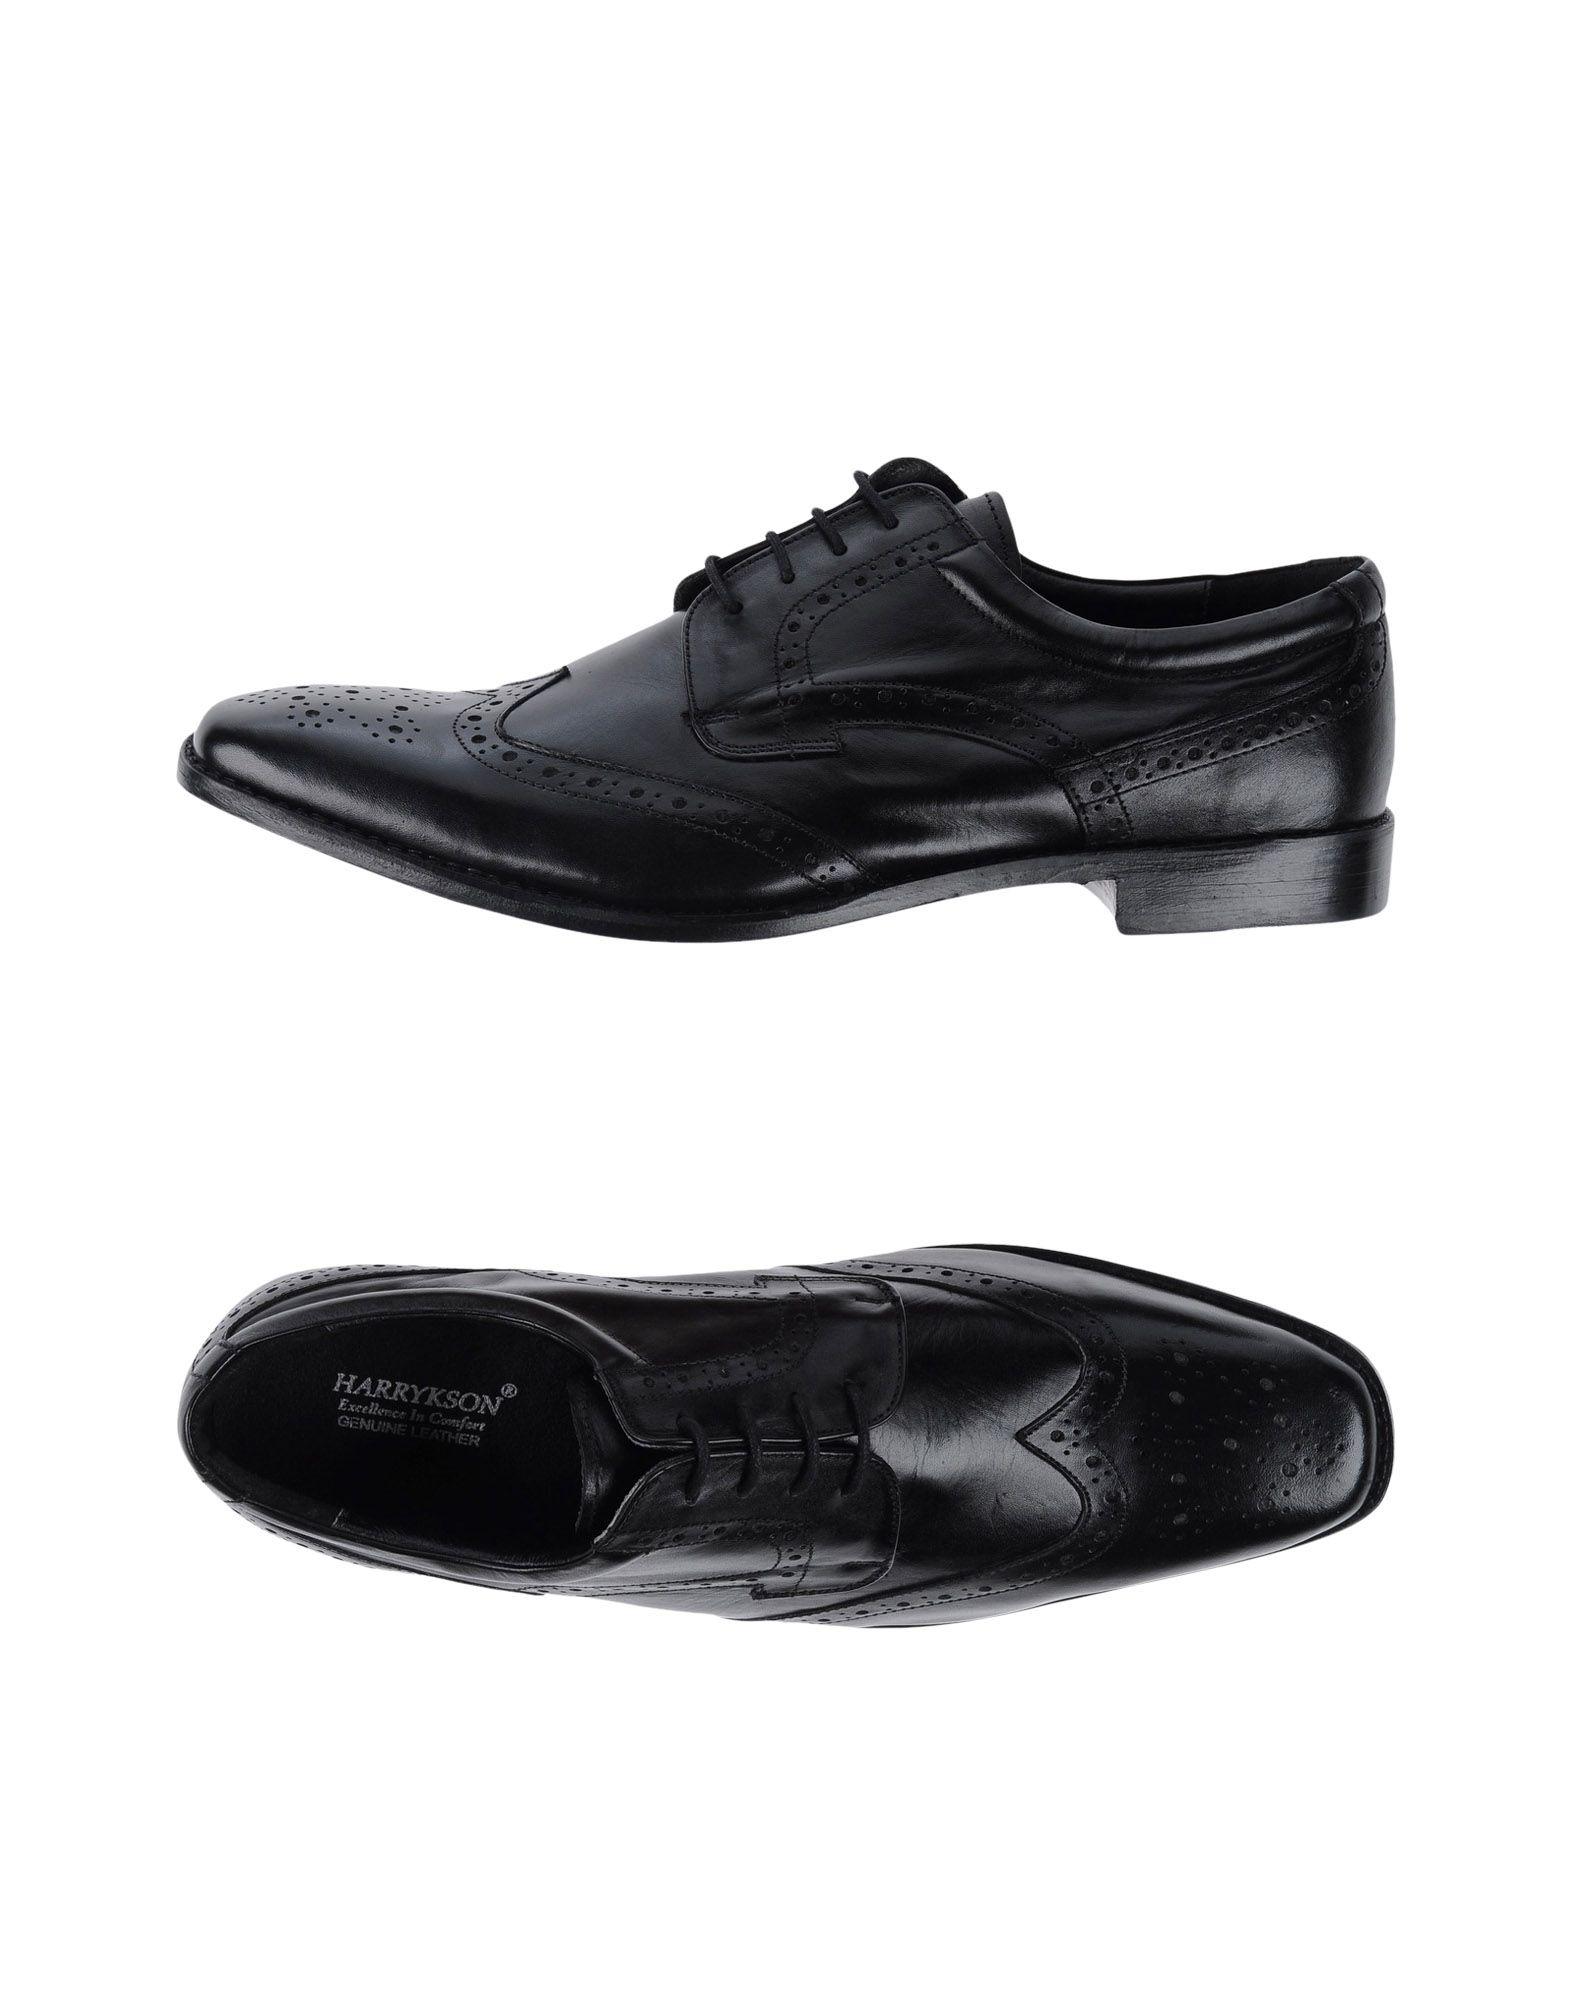 Rabatt echte Schuhe Harrykson® Schnürschuhe Herren  11075816XR